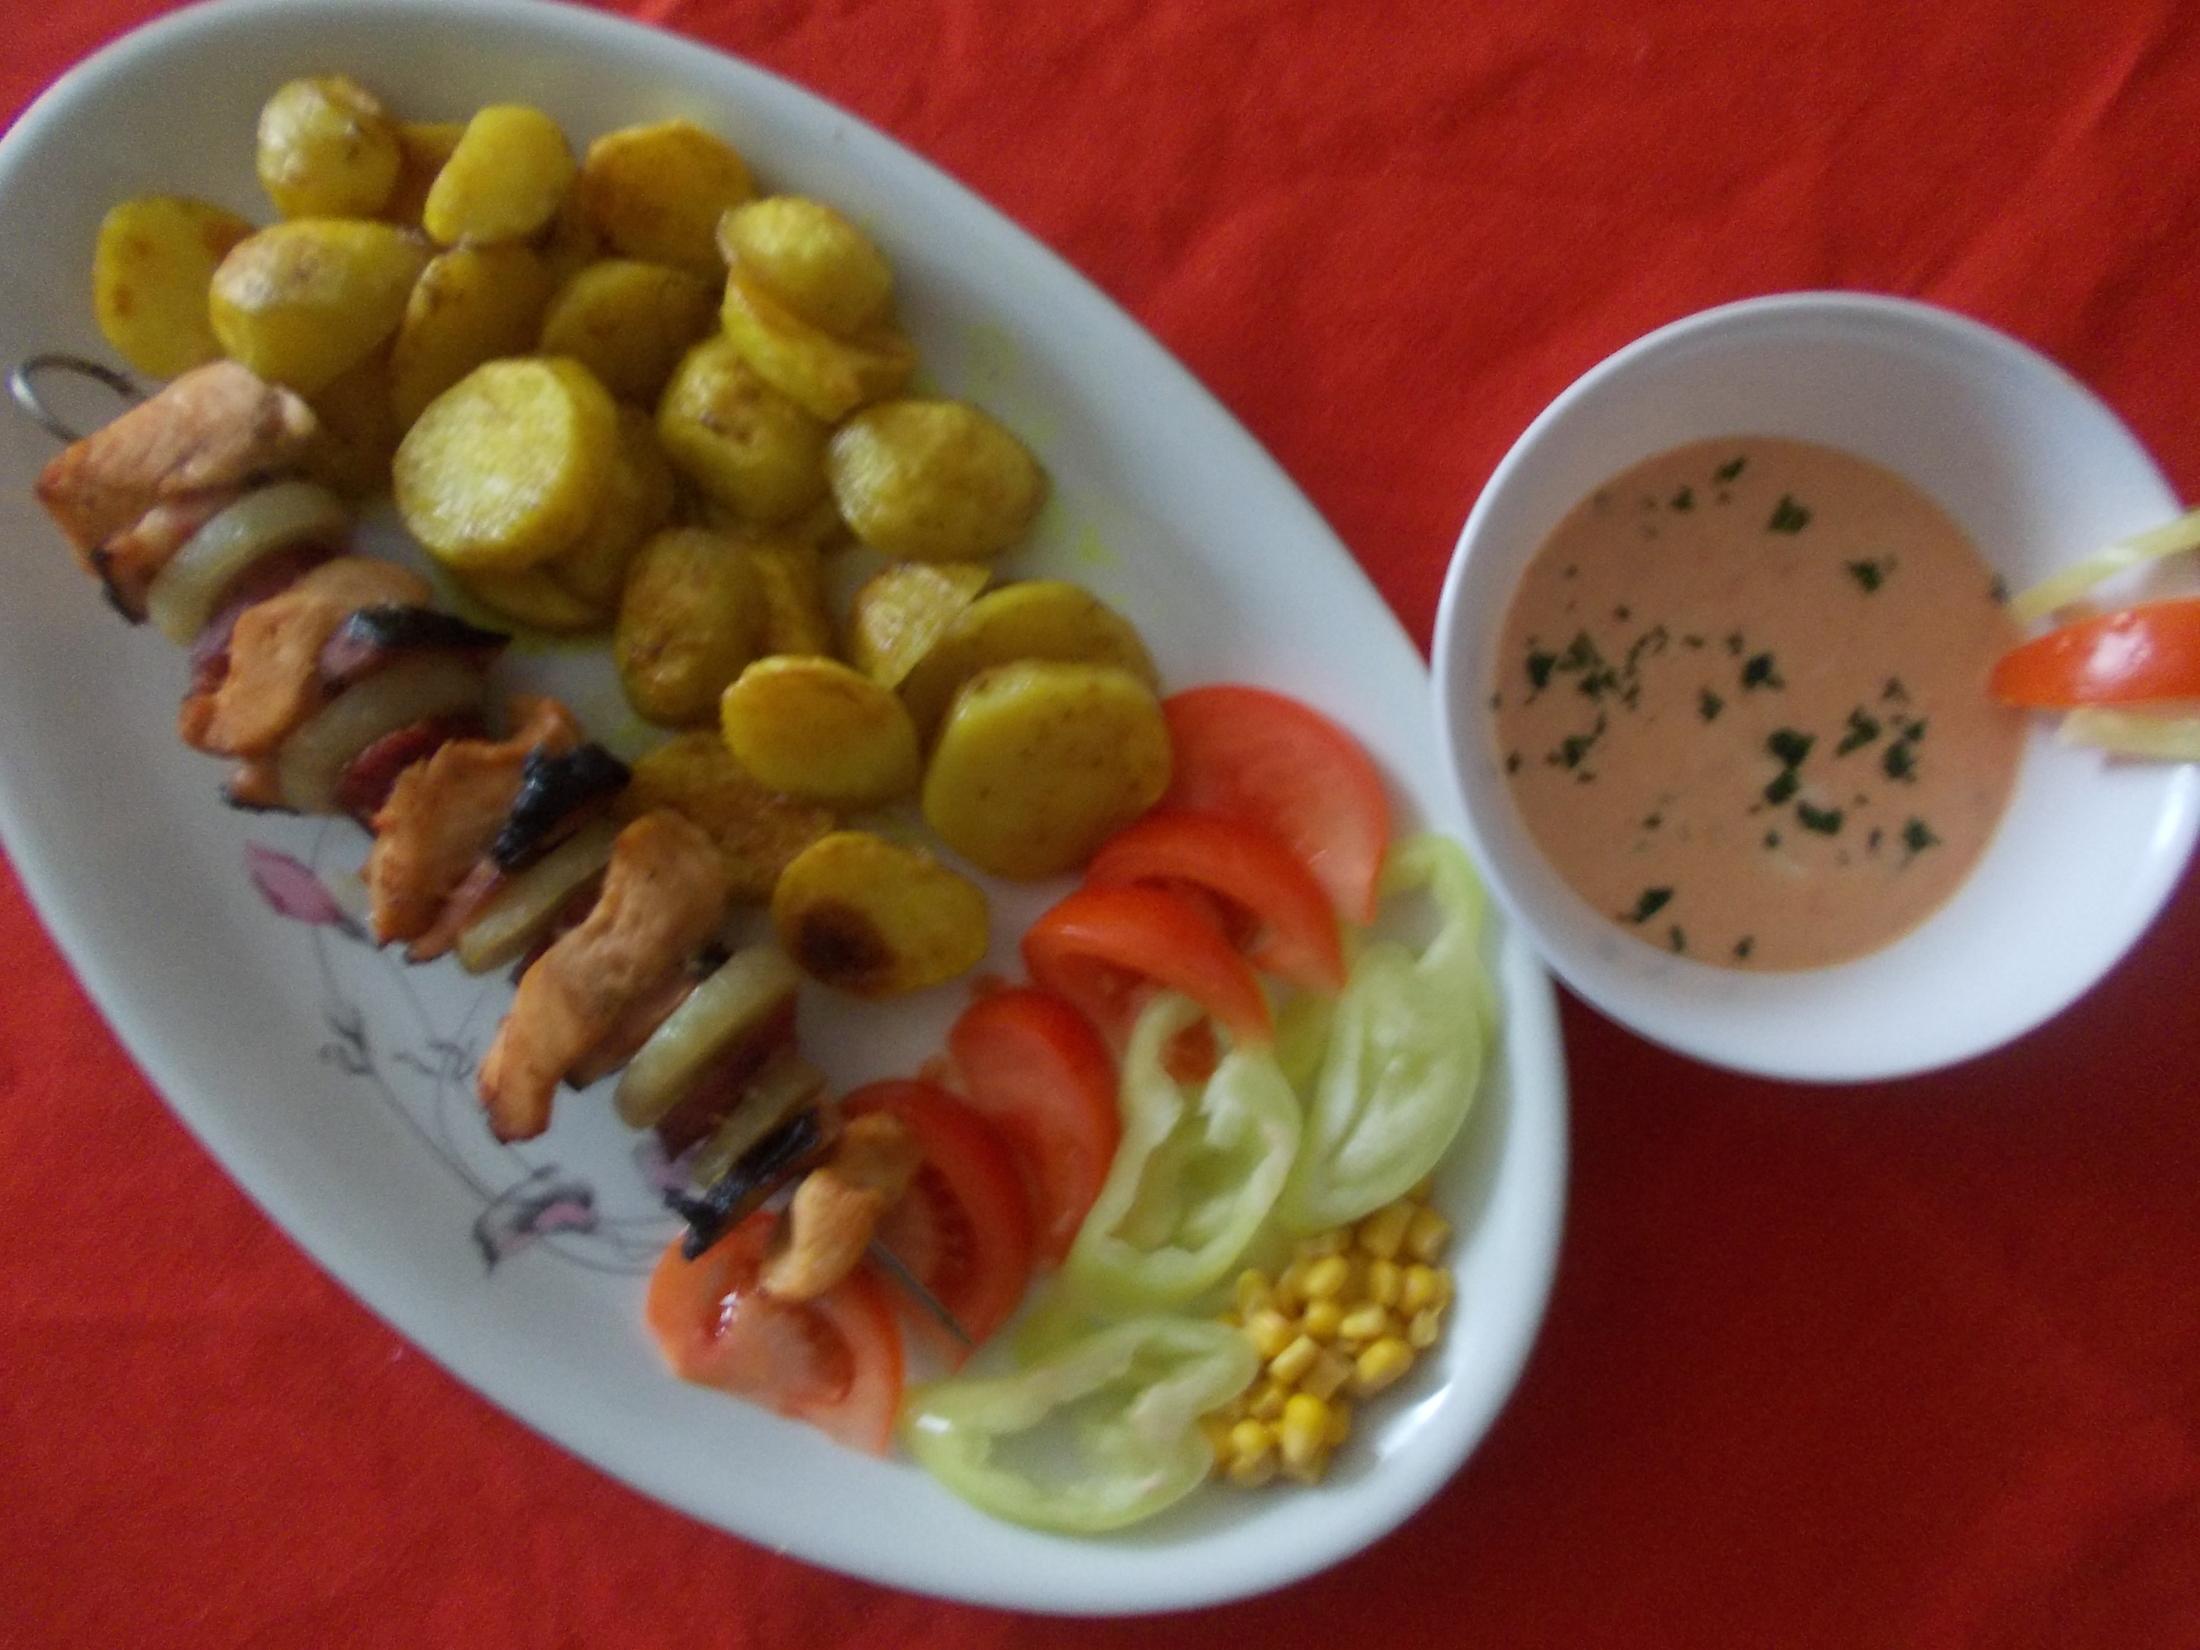 Fotografie receptu: Kuřecí ražniči s klobásou a pečenými bramborovými dukátky